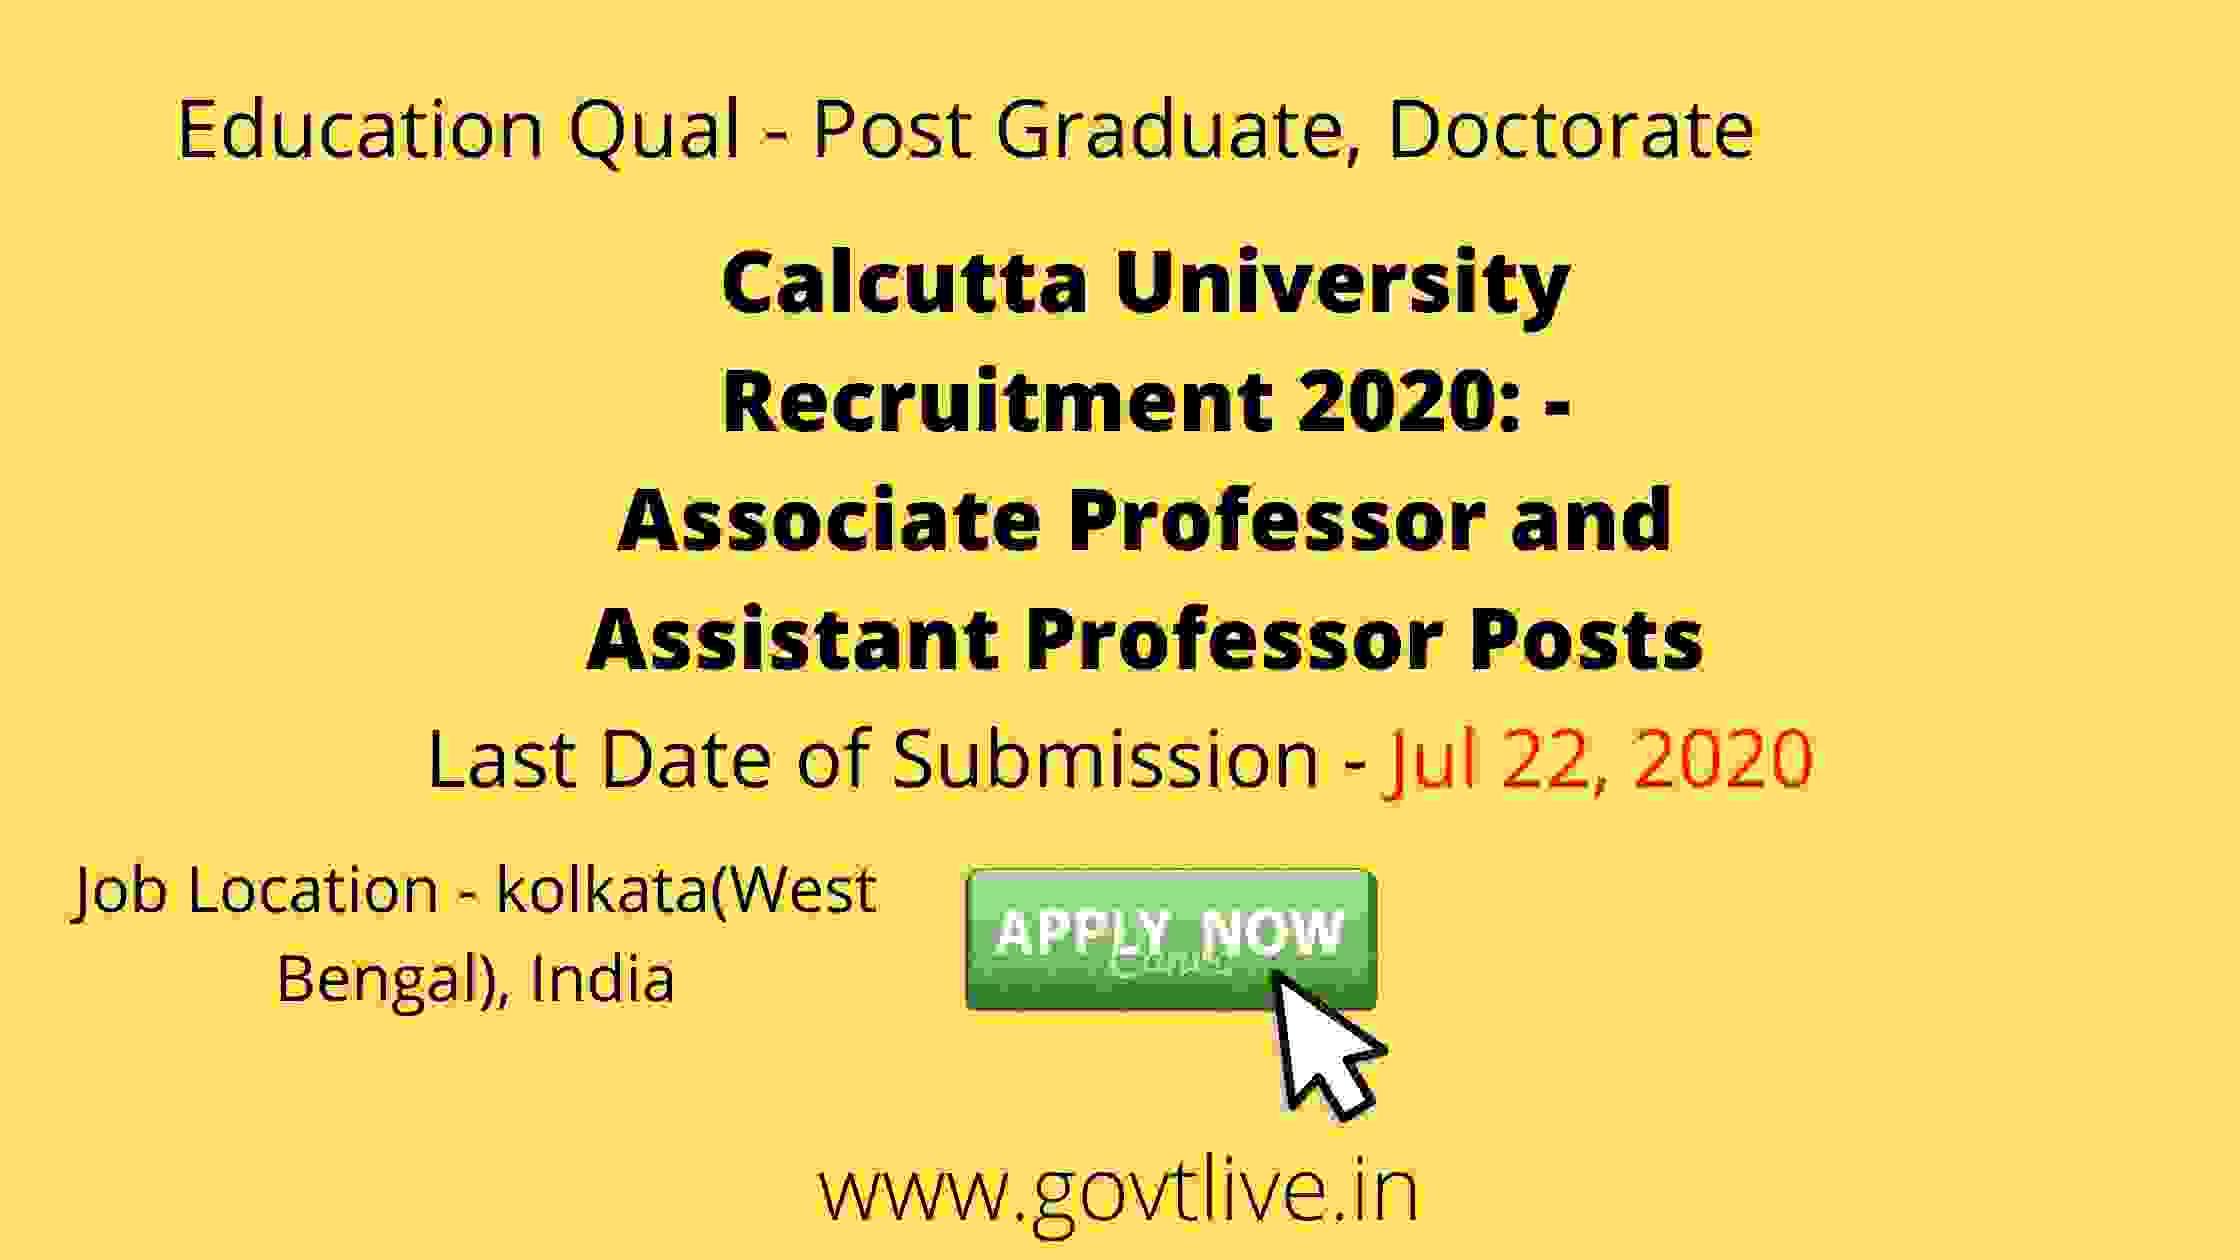 Calcutta University Recruitment 2020: - Associate Professor and Assistant Professor Posts